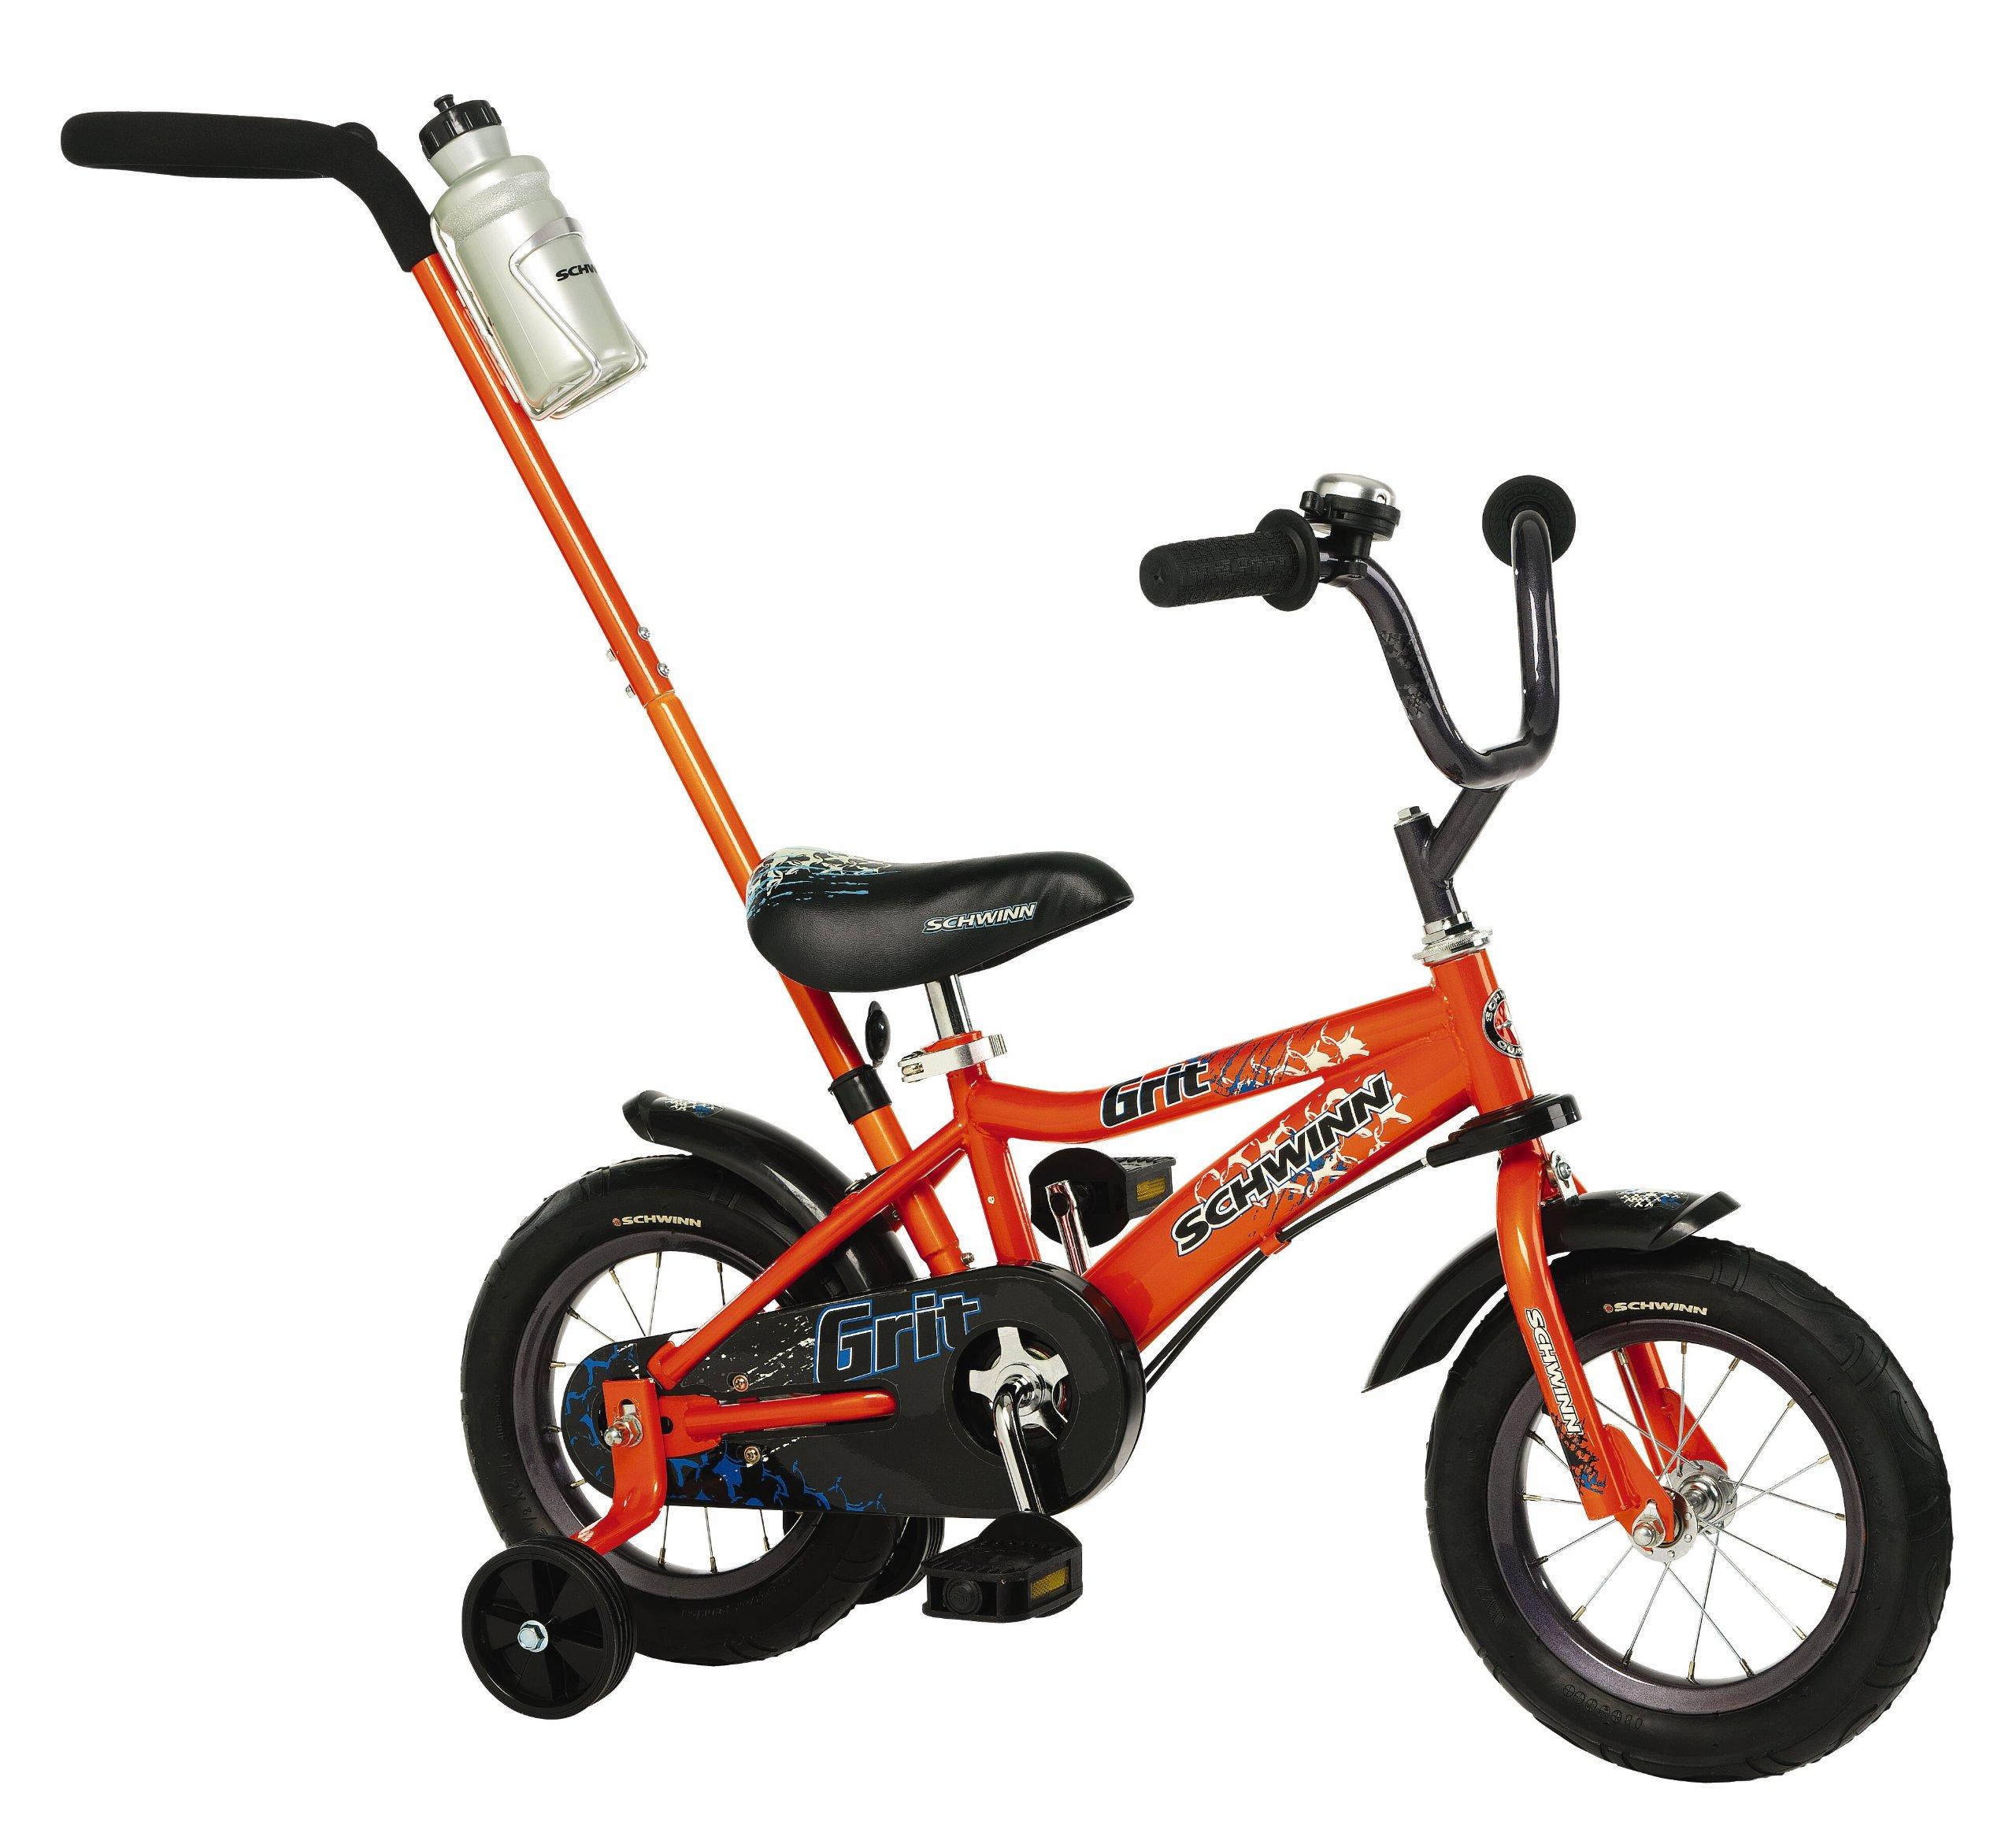 Schwinn Boys' 12-Inch Grit Bike,Orange